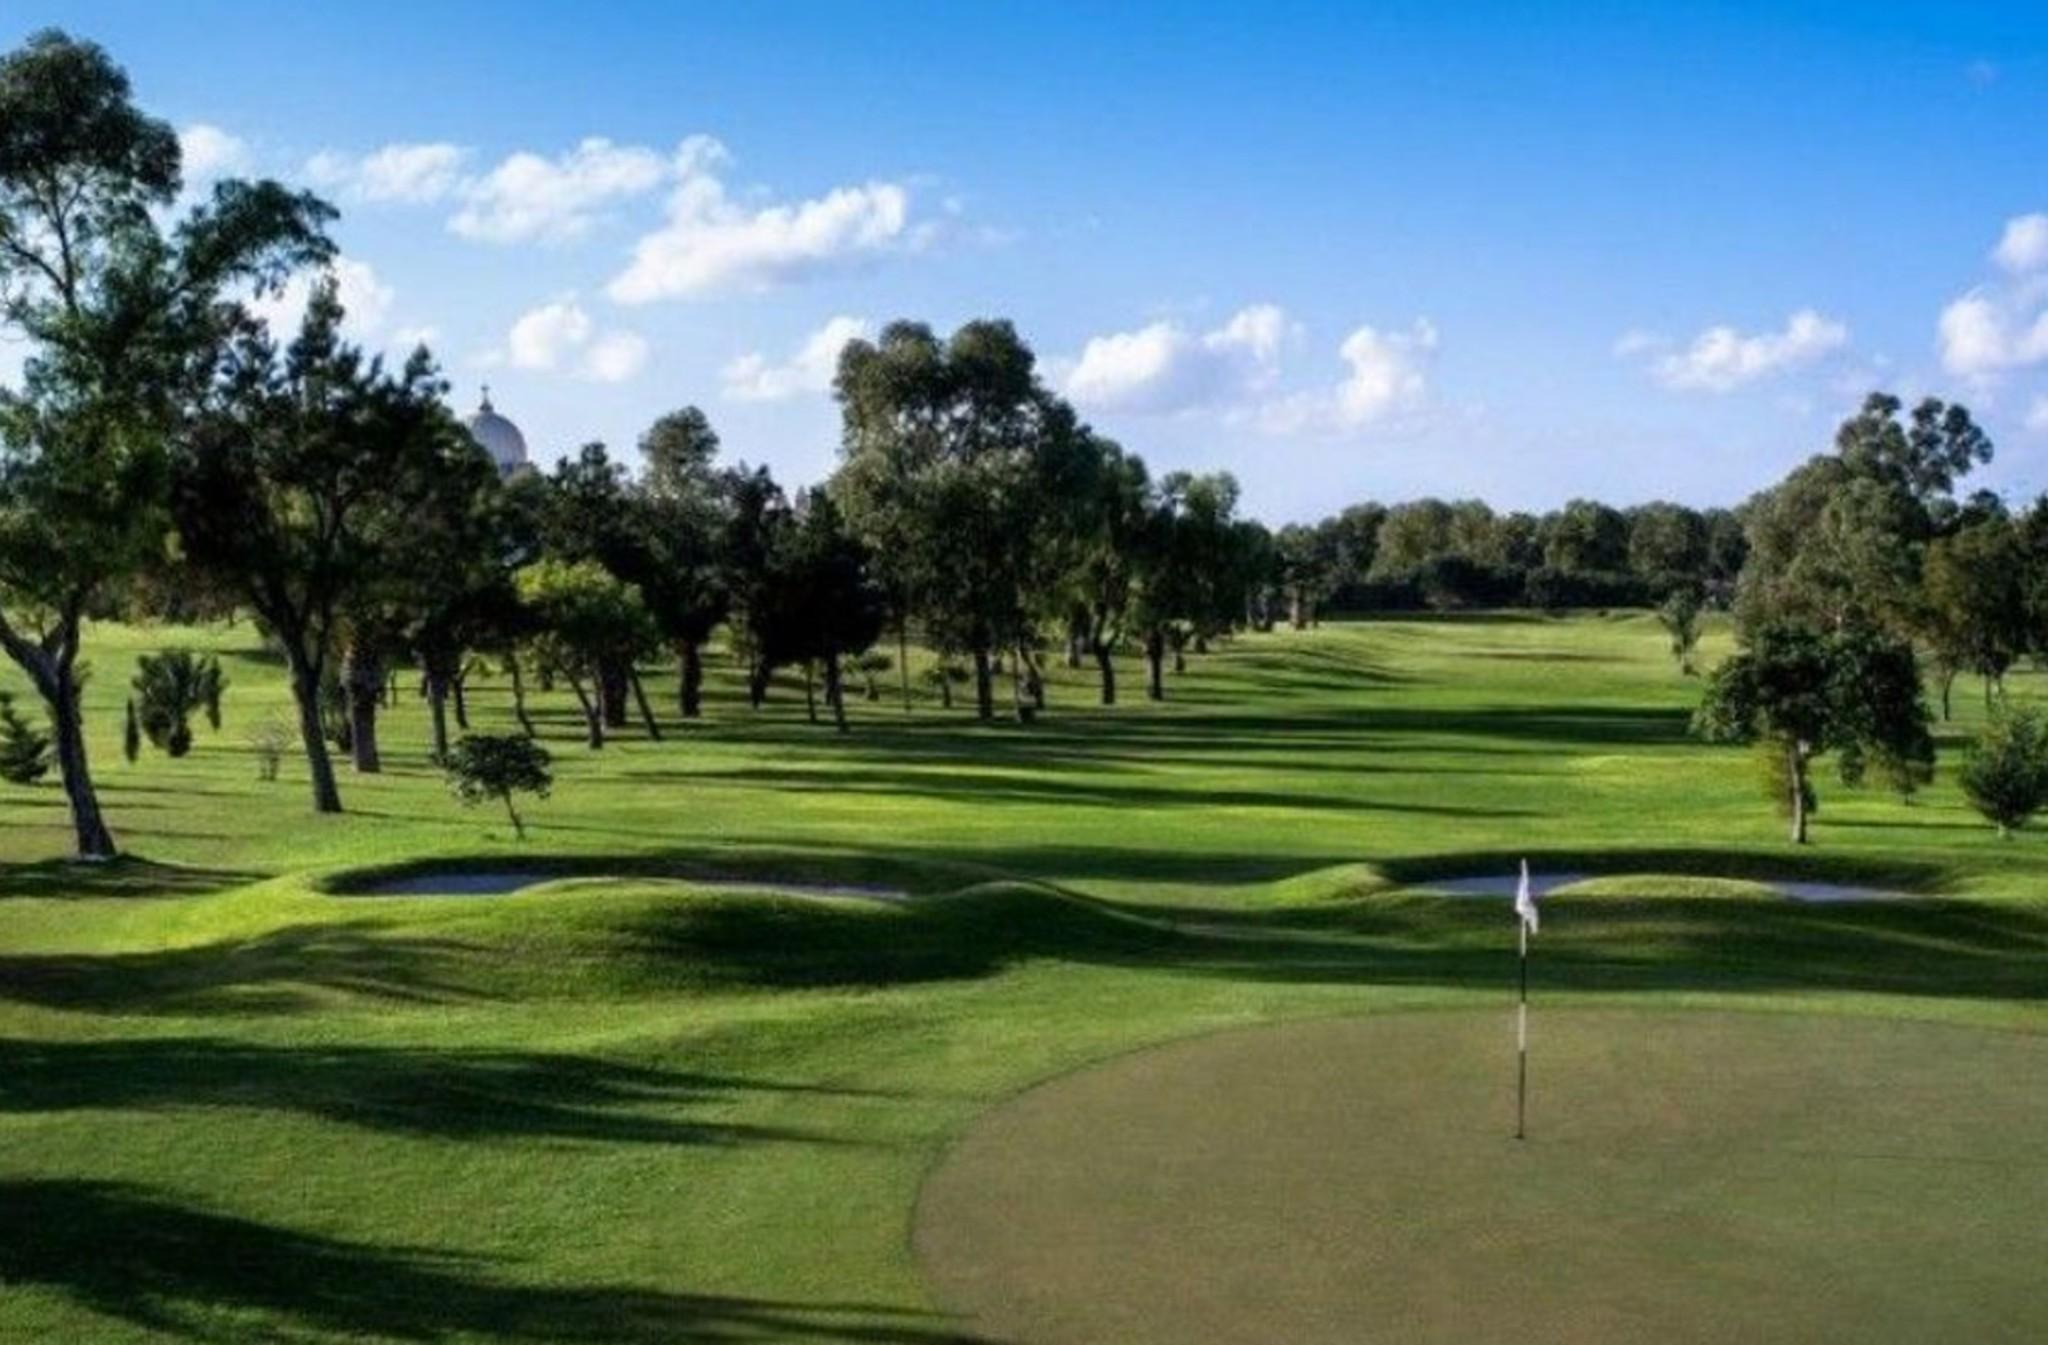 Golf-in-Malta-1 (1)